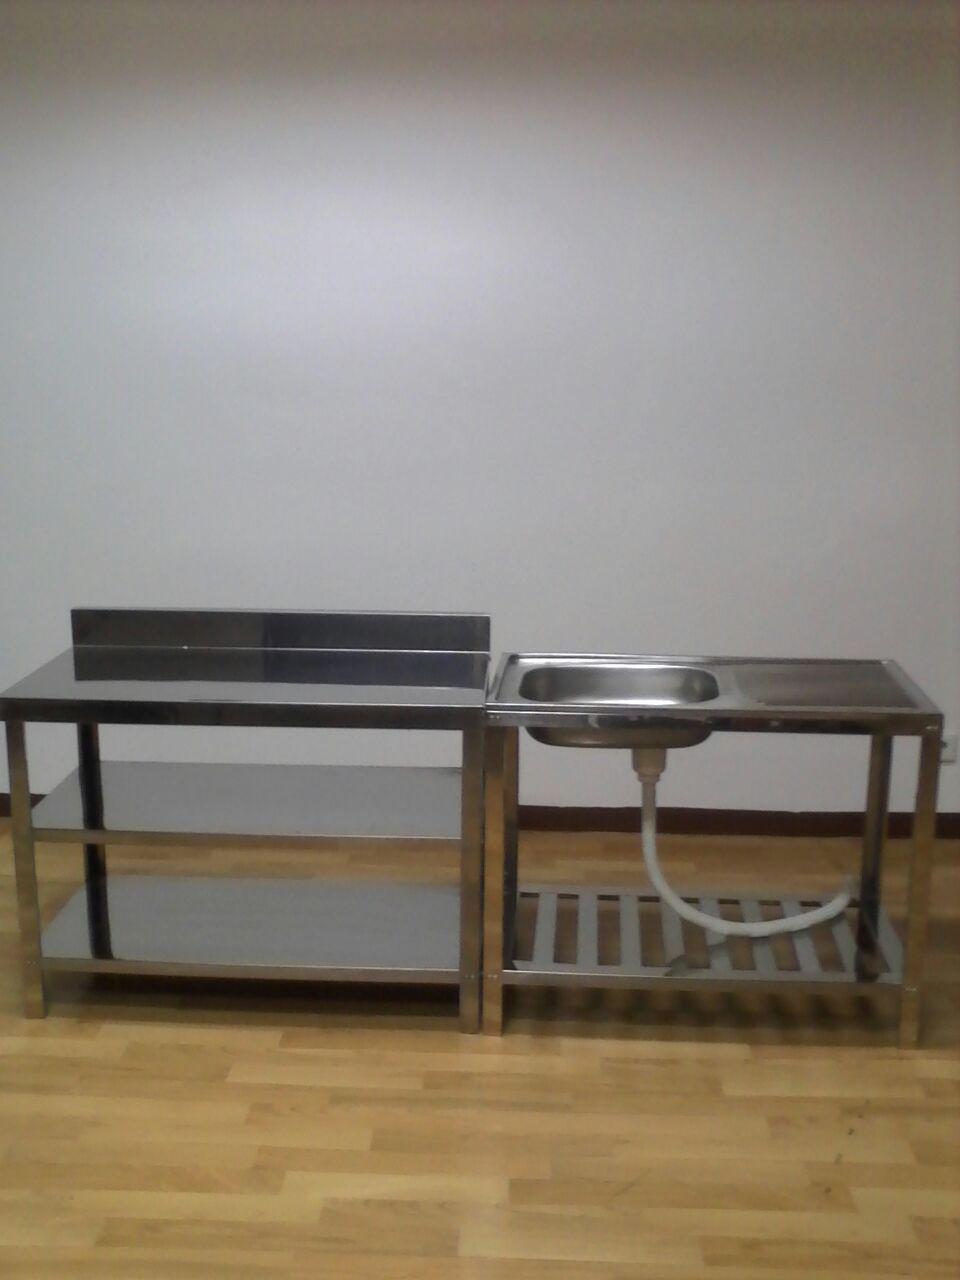 Meja Dan Kitchen Sink Merk Metalco